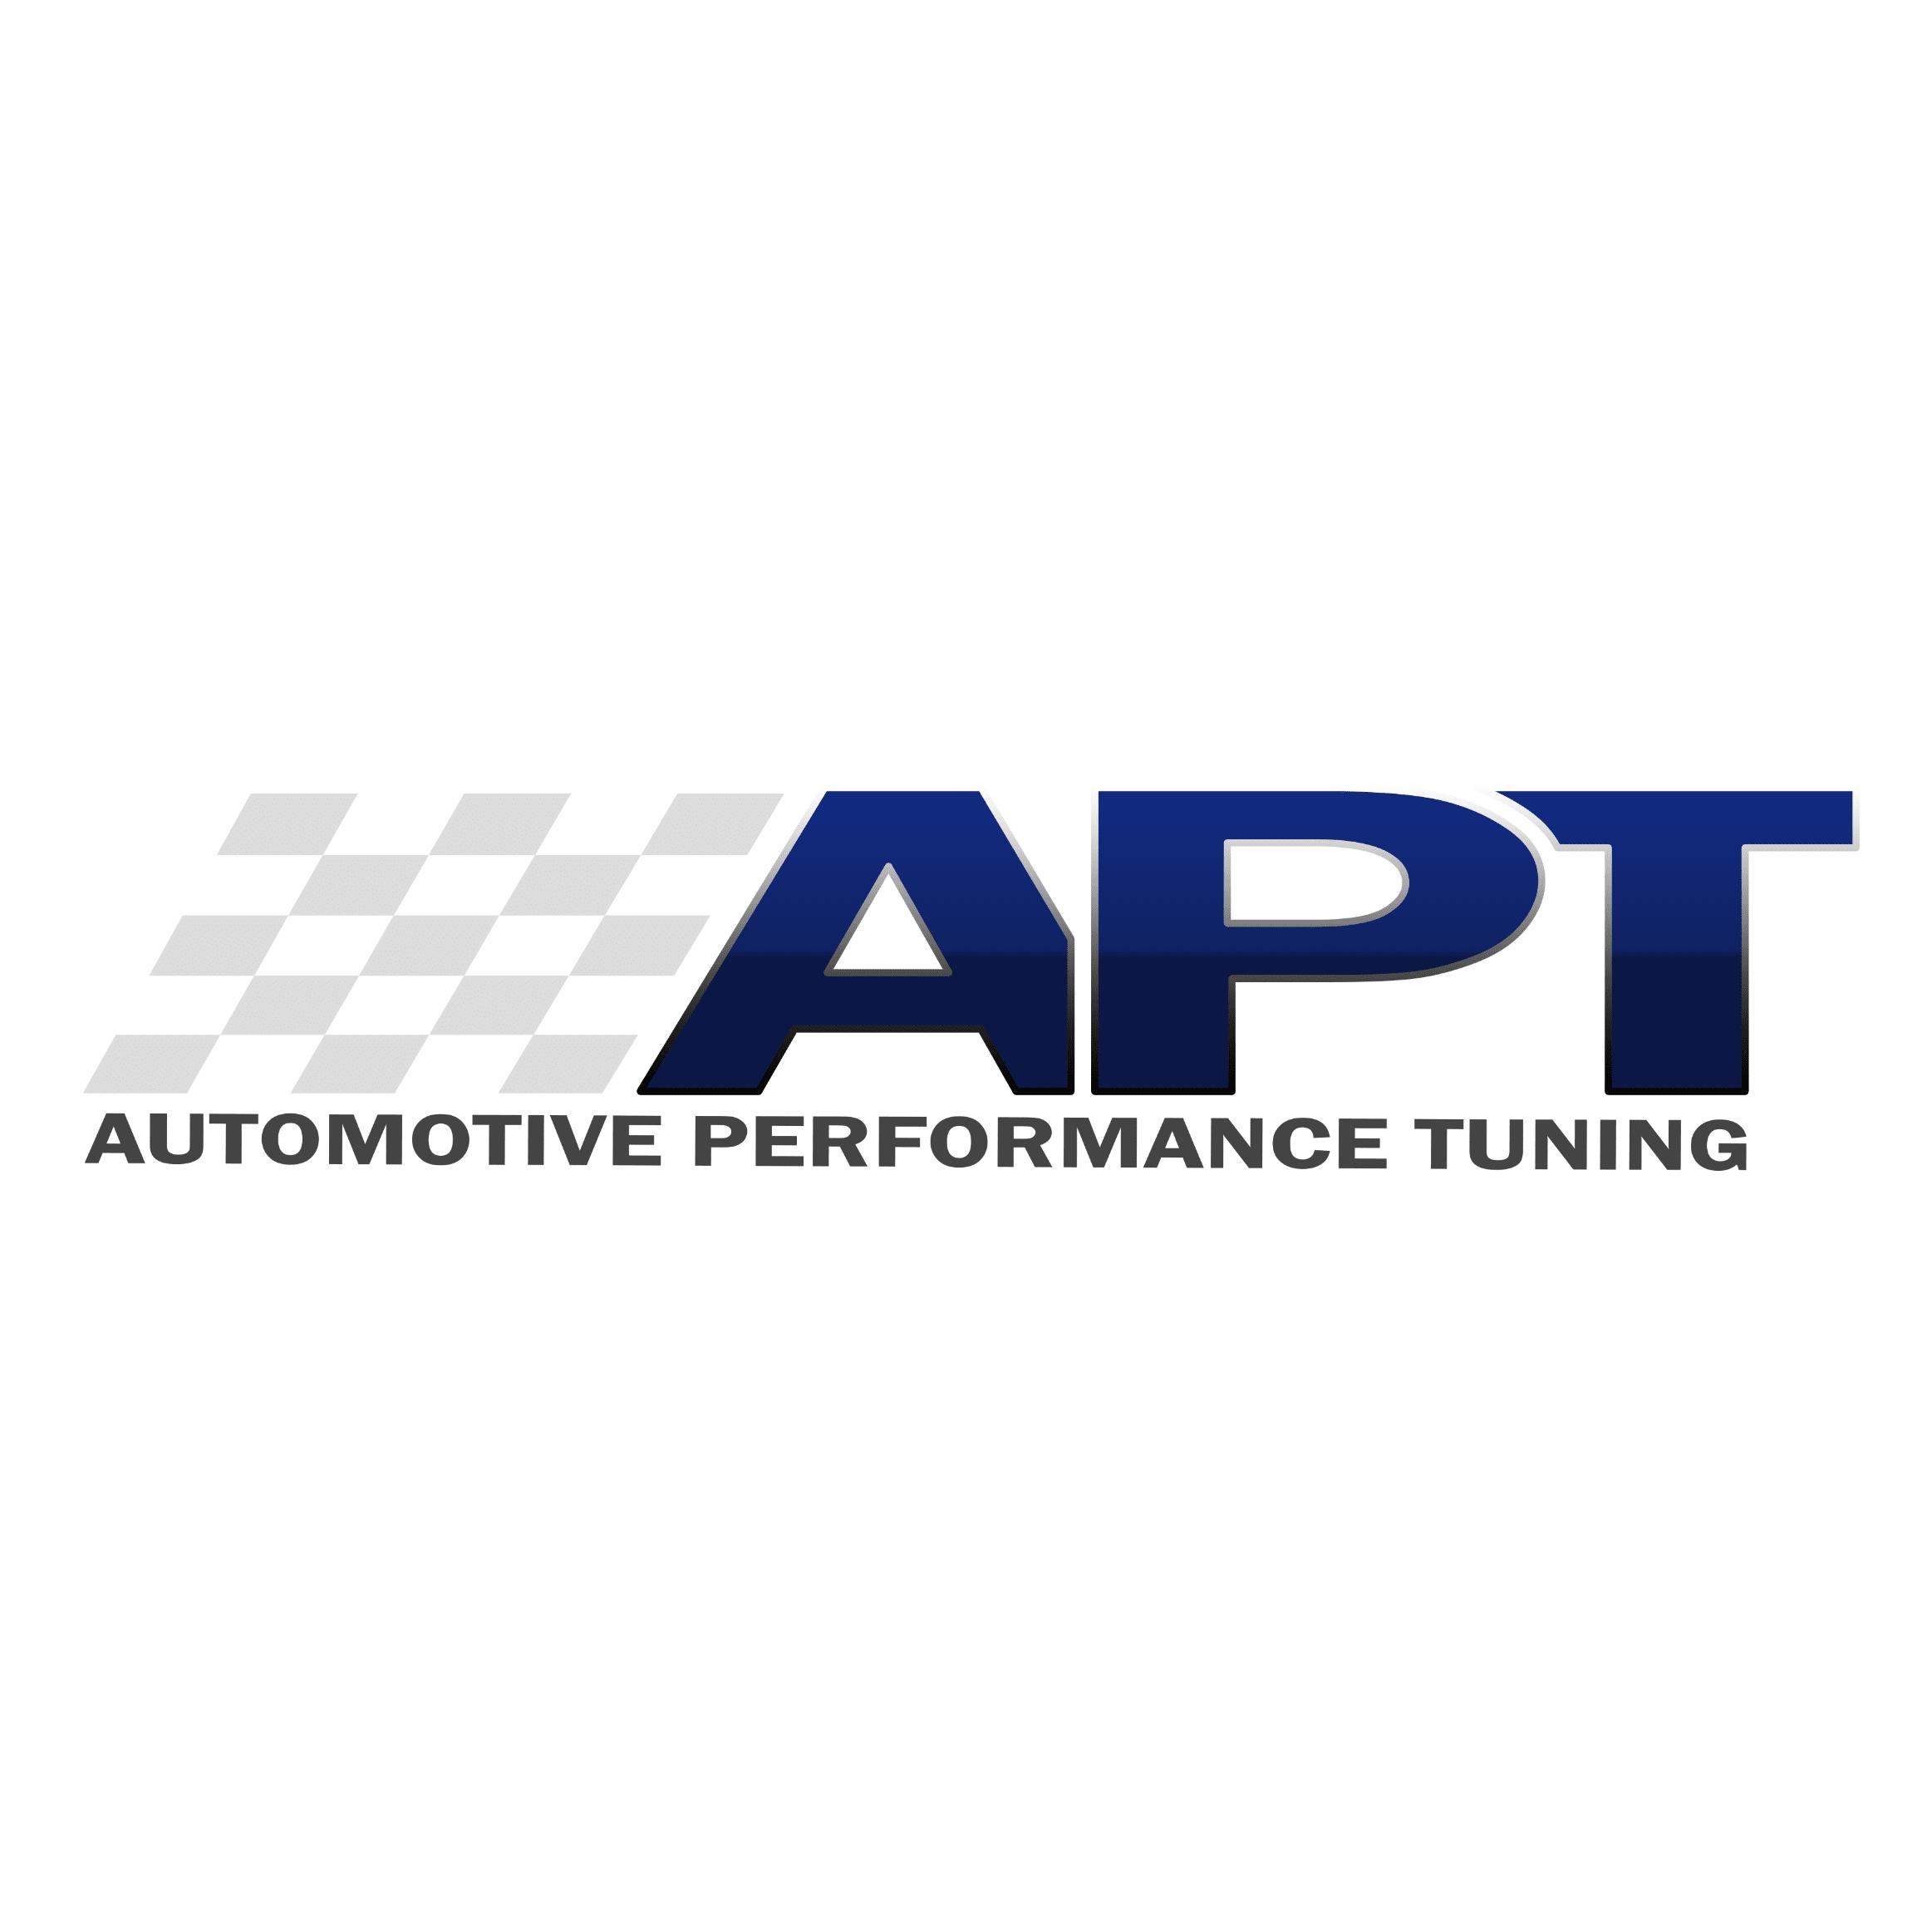 automotive performance tuning